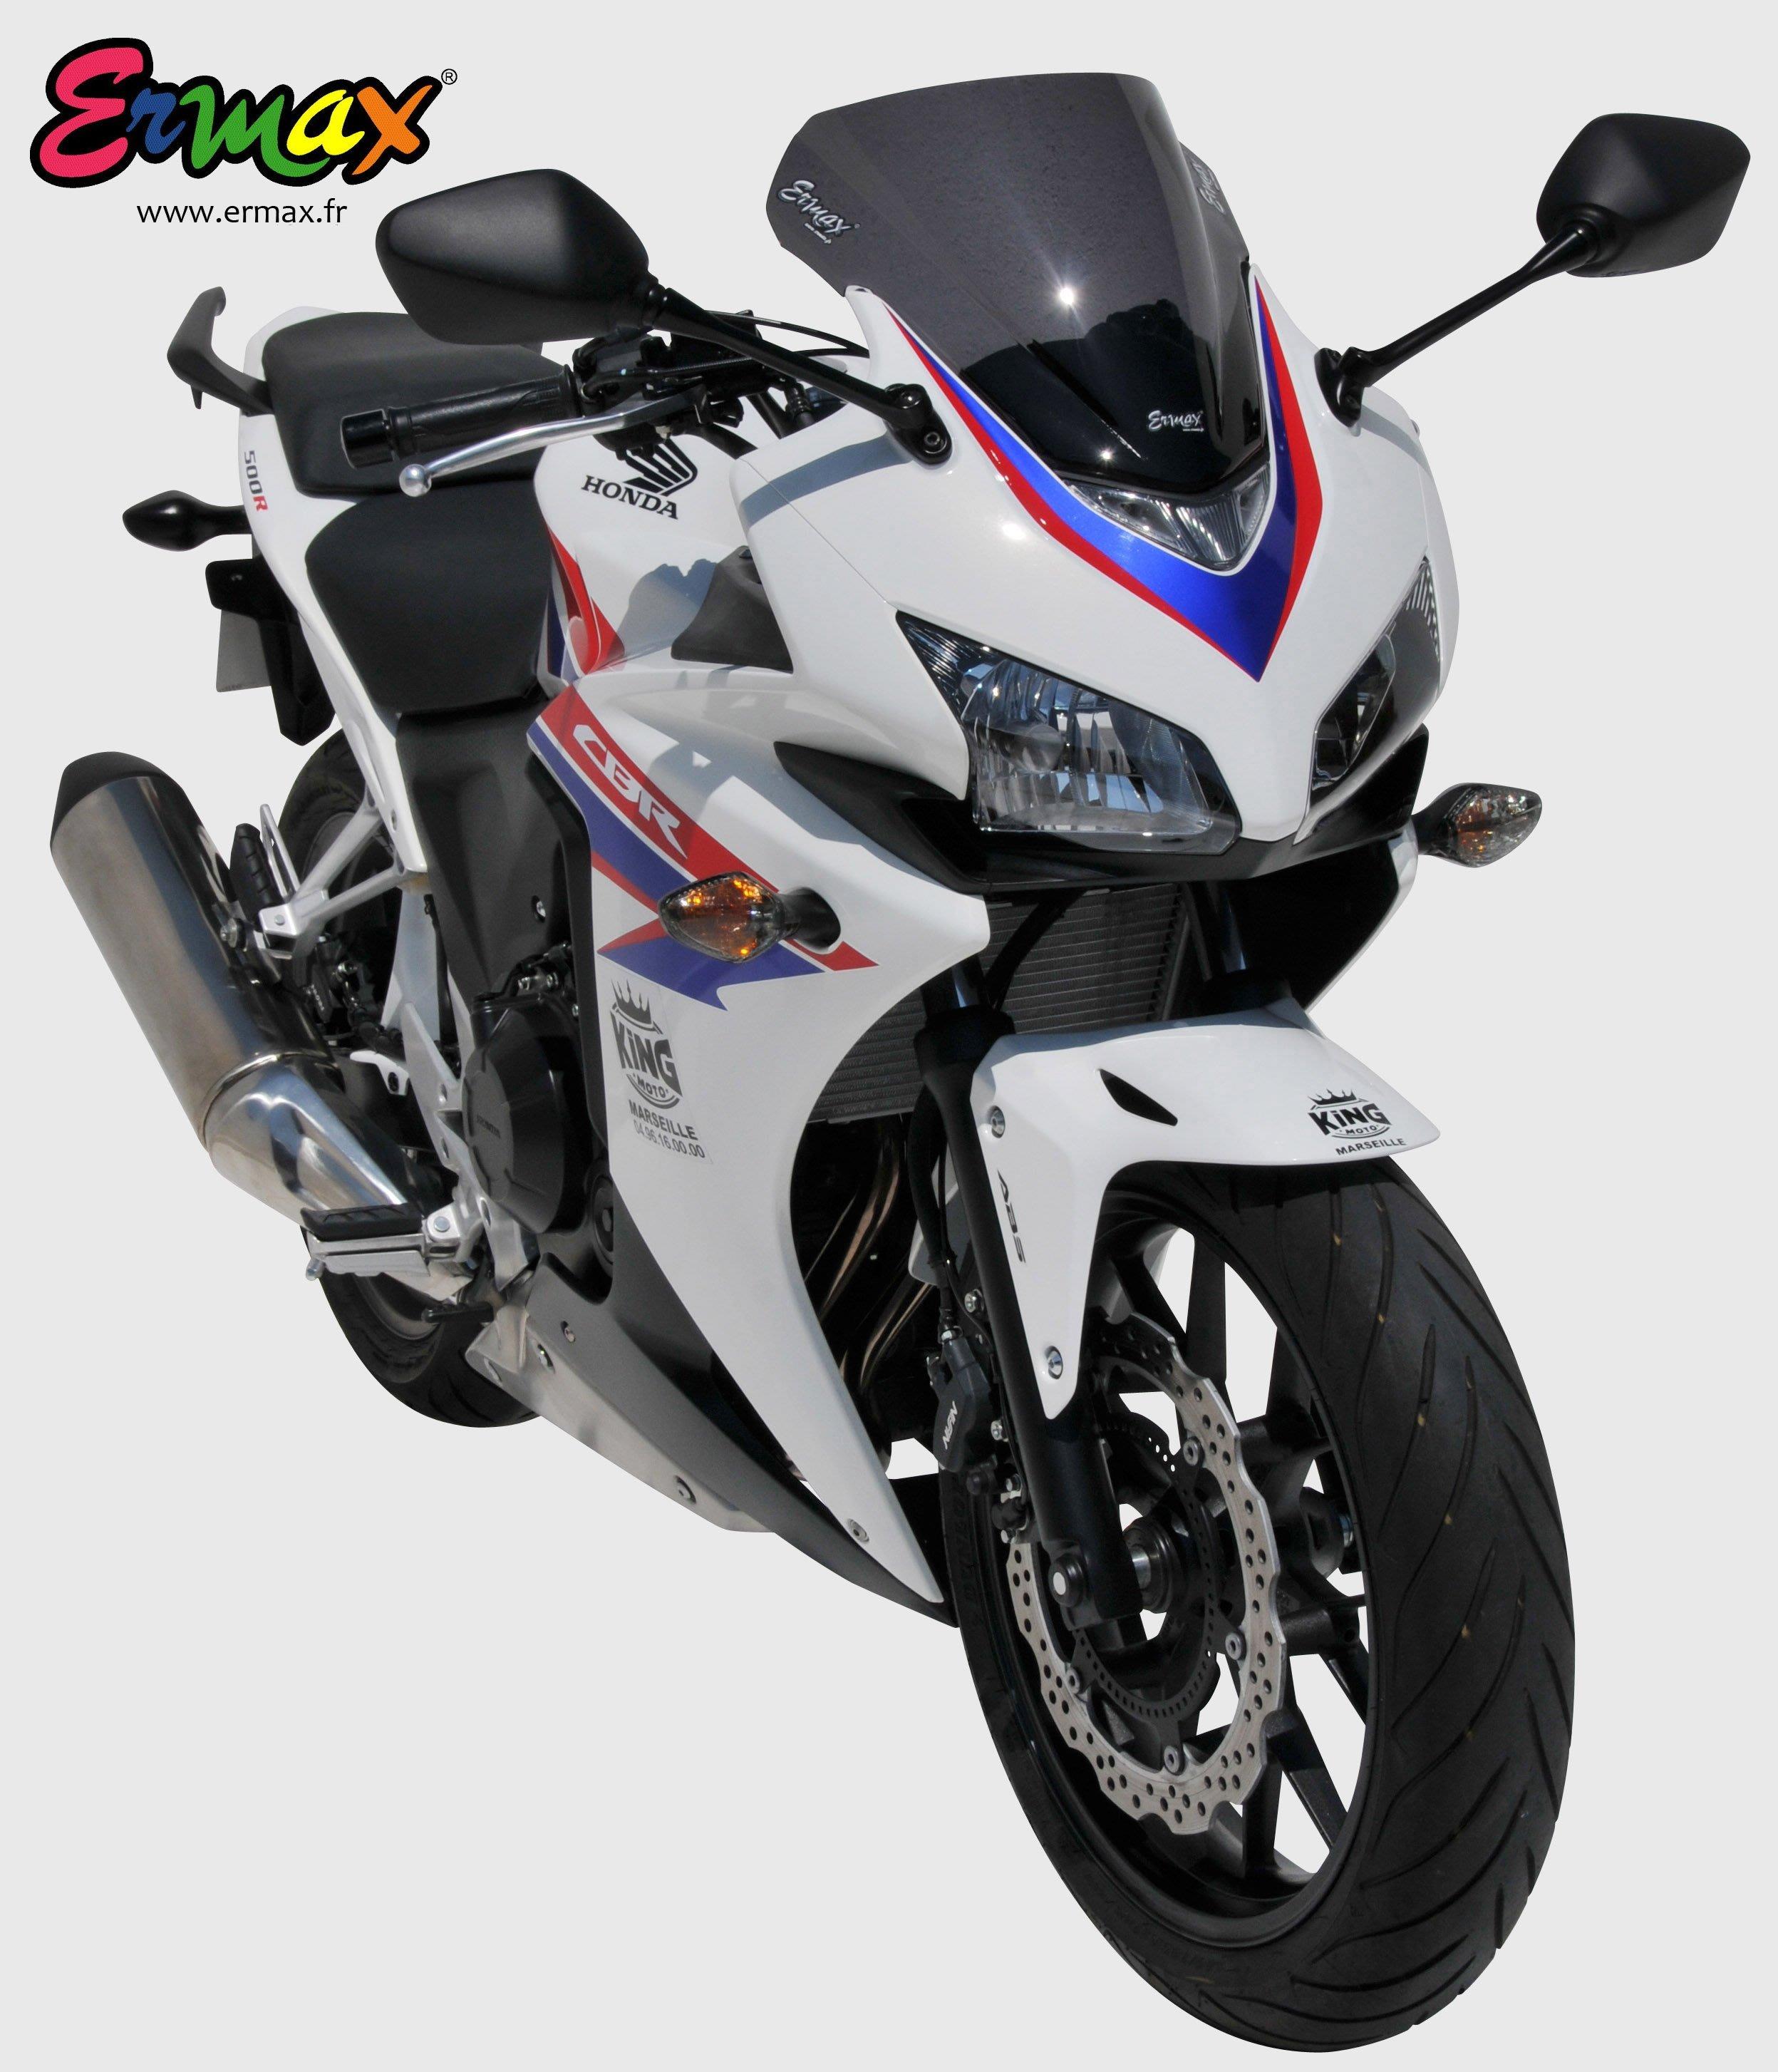 ERMAX HONDA CBR500R 風動款高角度風鏡 消光色